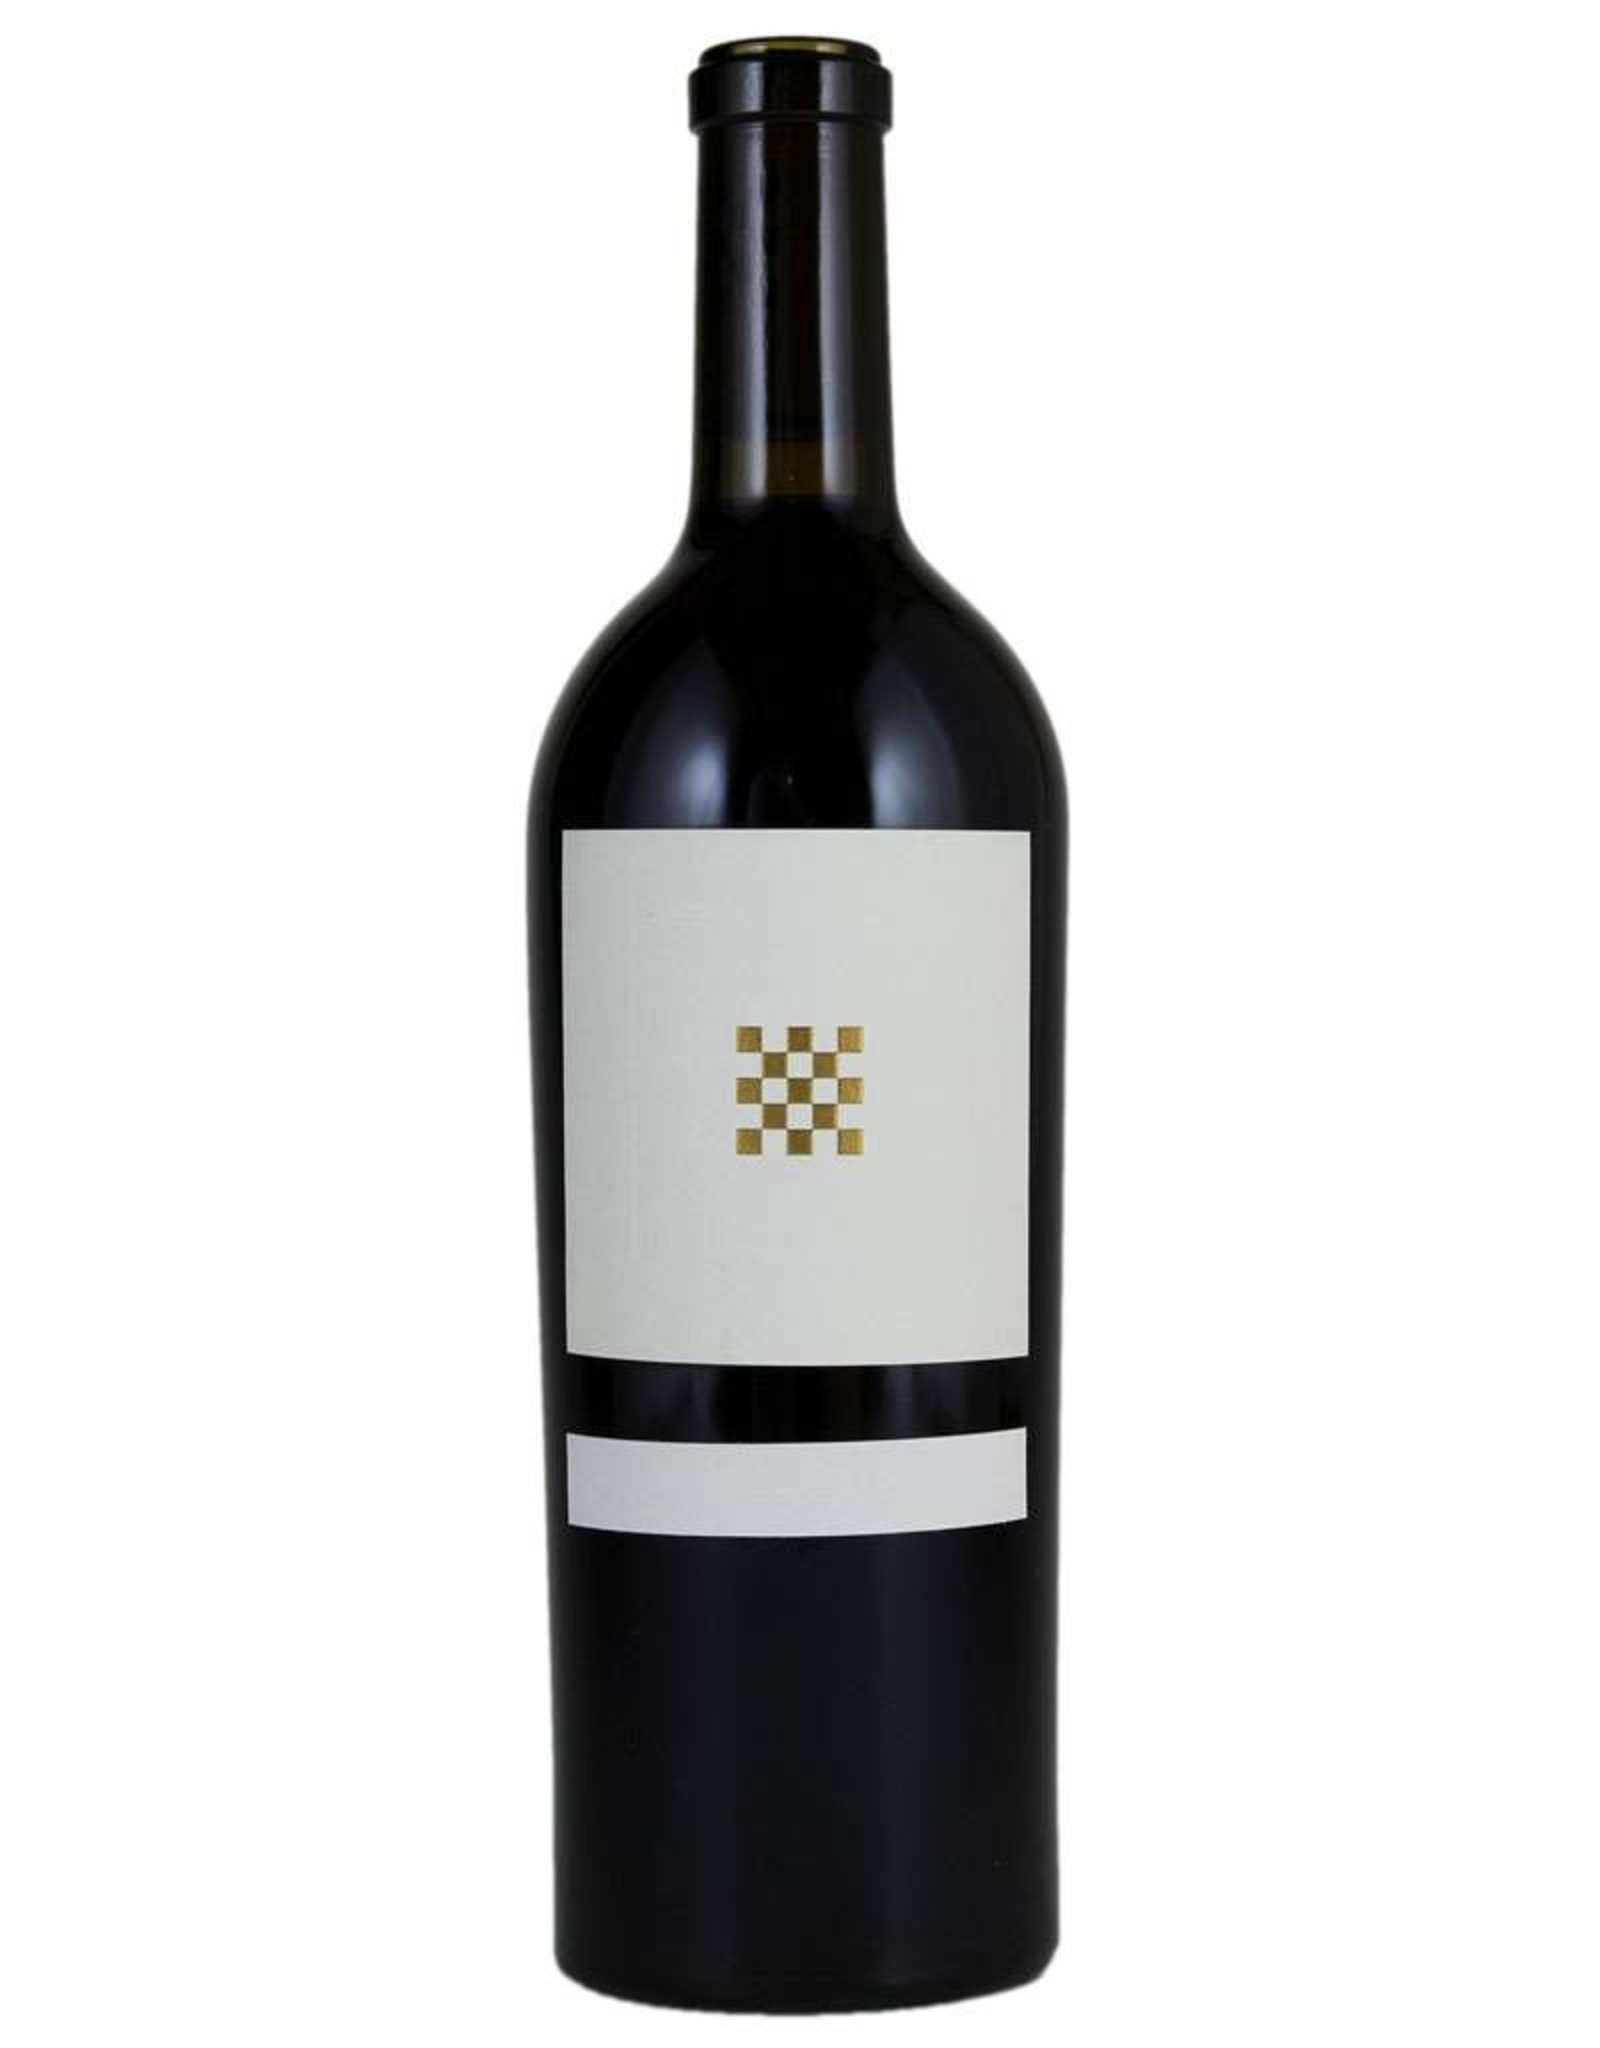 Red Wine 2012, Checkerboard Vineyards, Red Bordeaux Blend, Aurora Vineyard, Napa Valley, California, 14.9% Alc, CT96